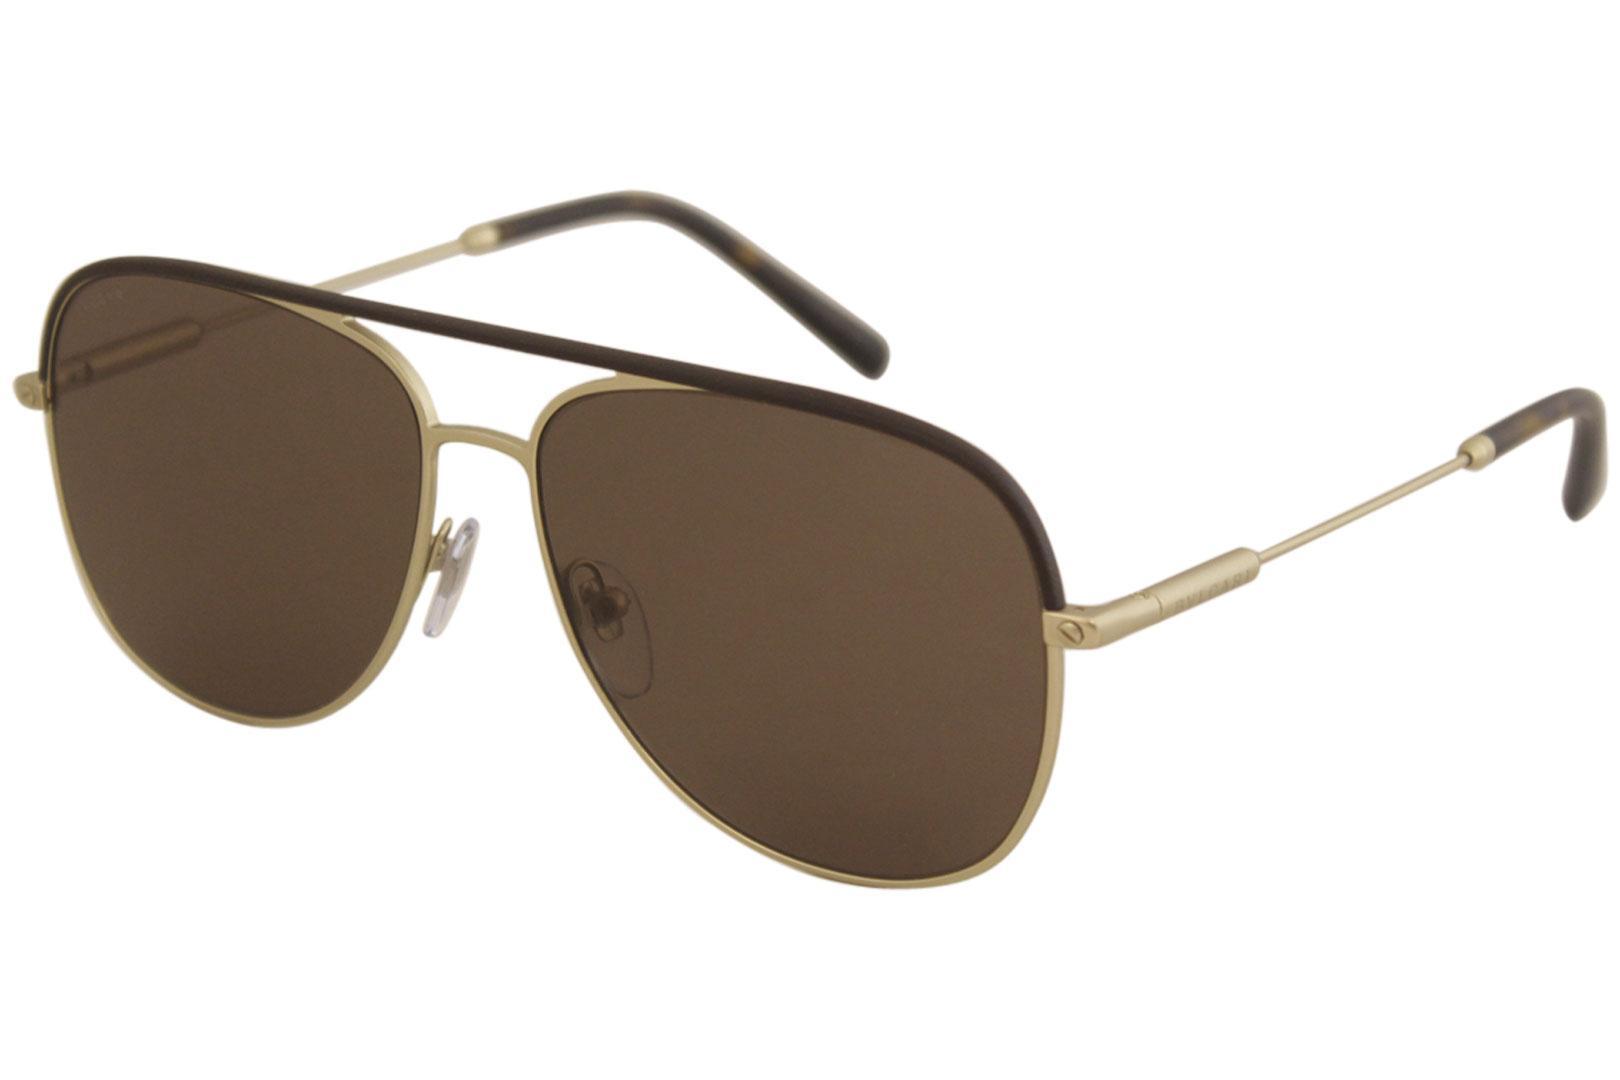 bvlgari sunglasses men 601782 al